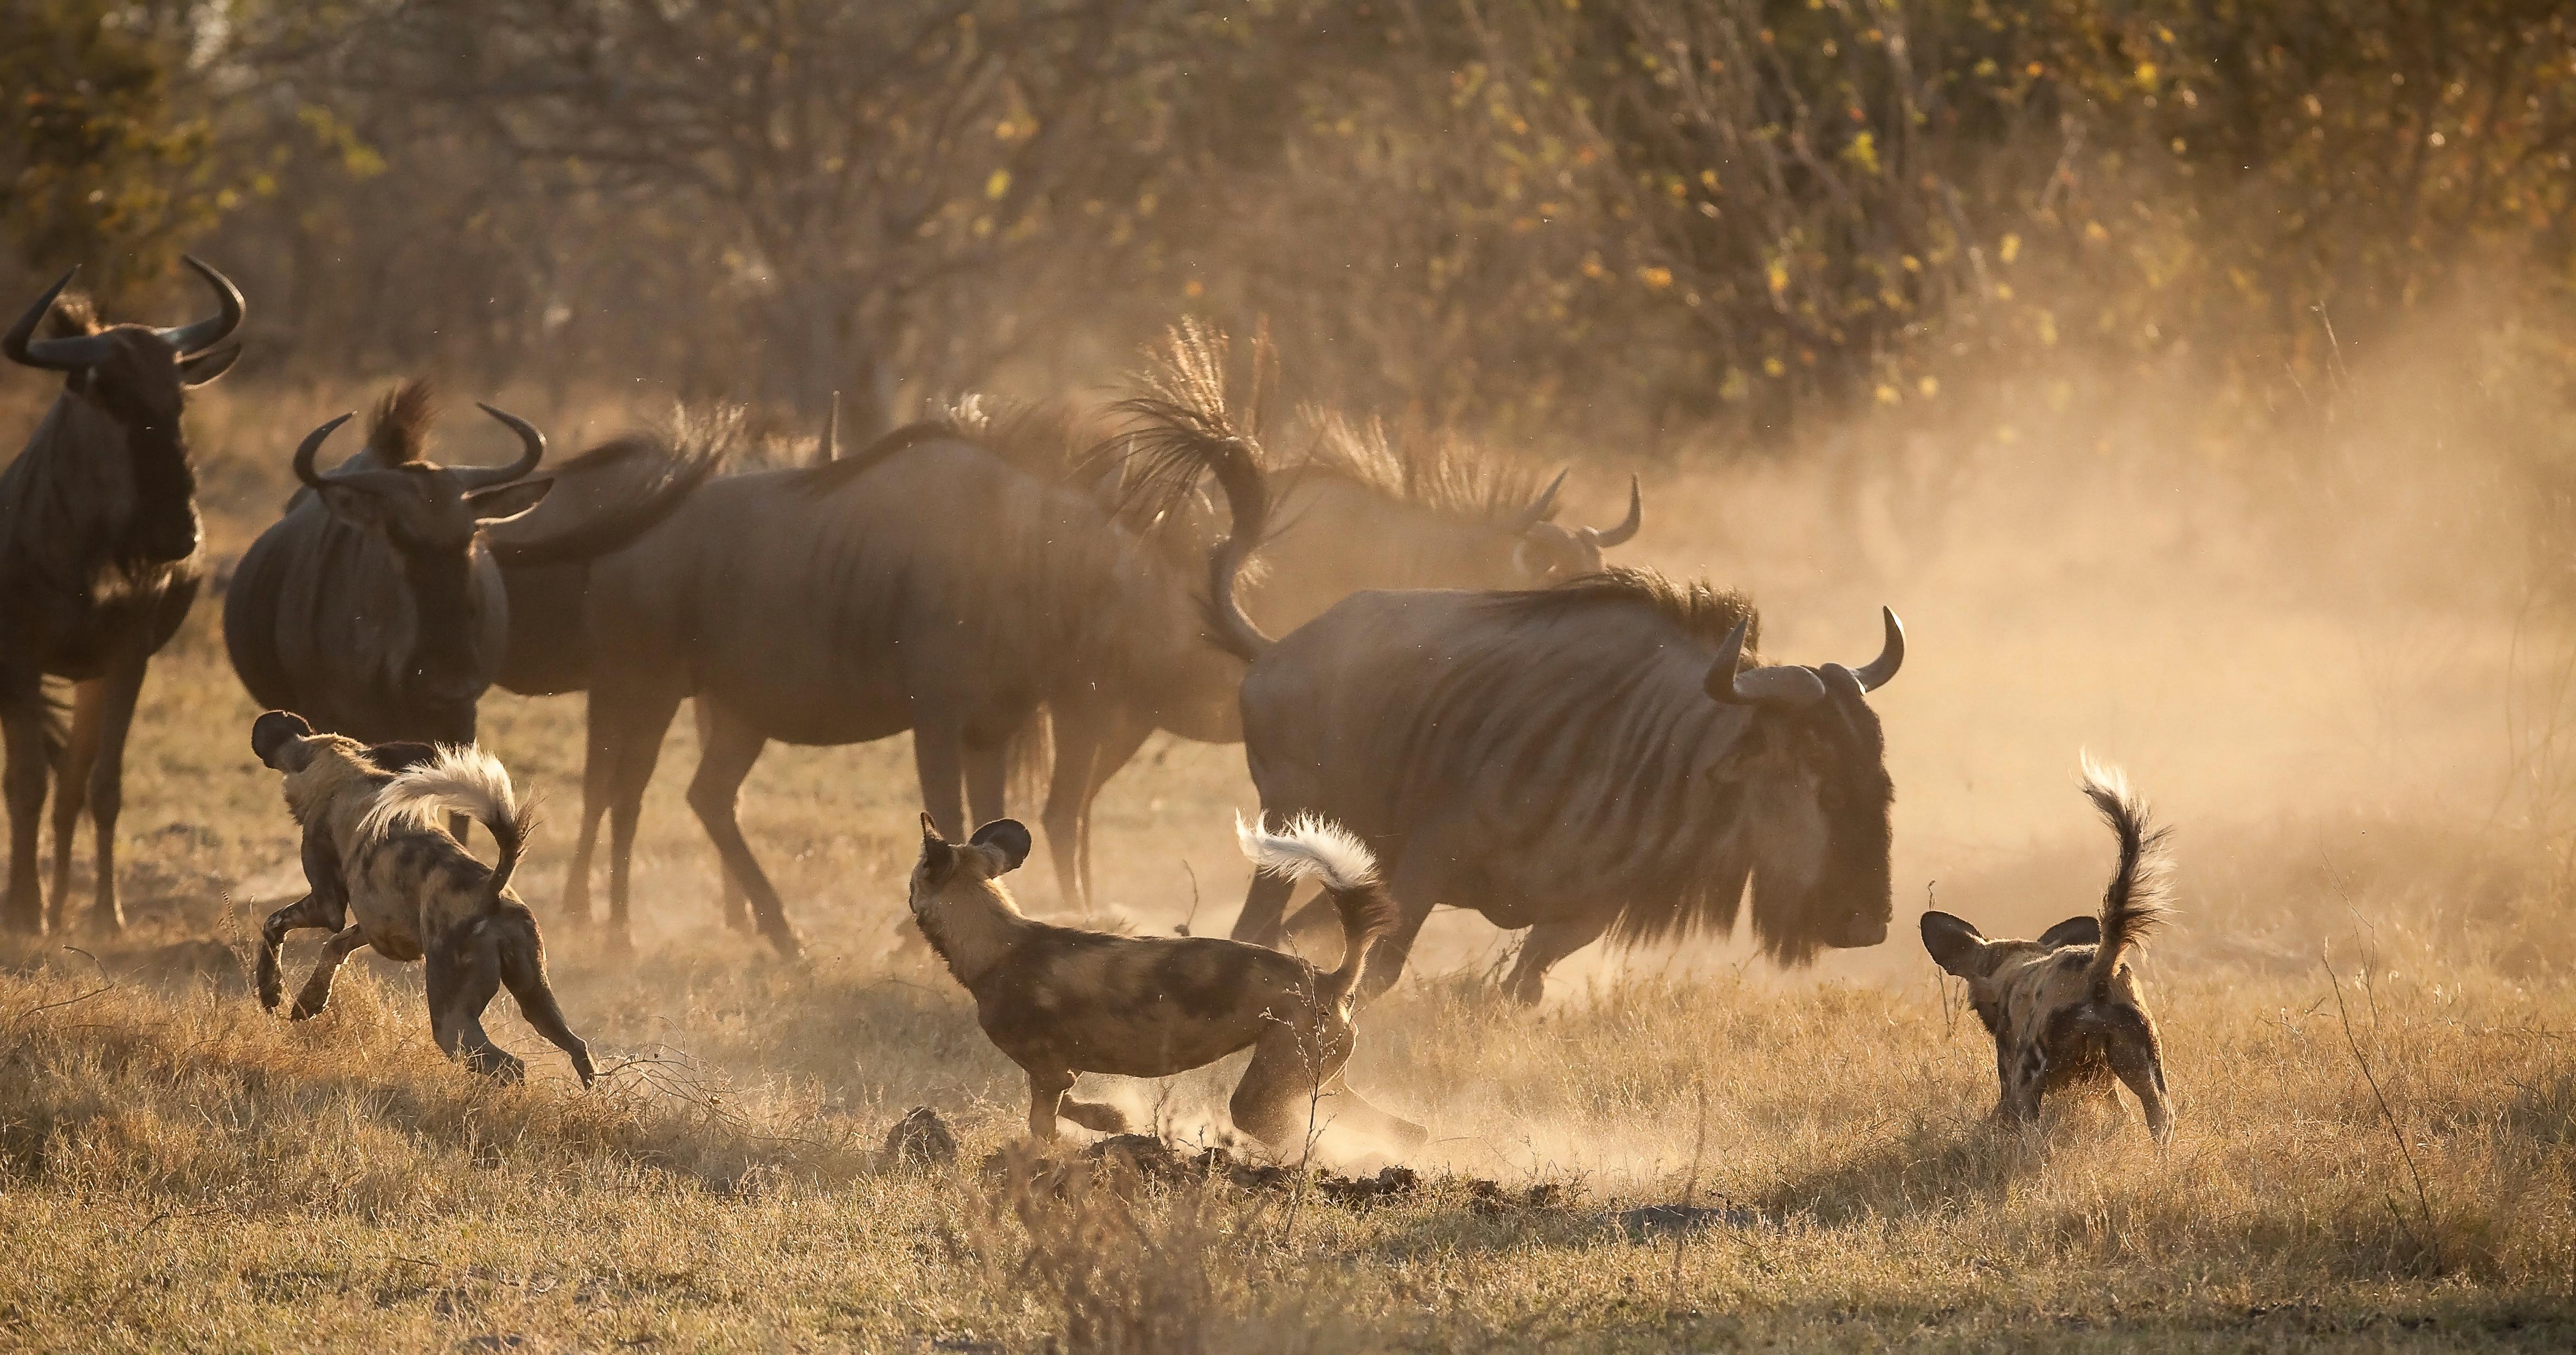 Kane Motswana ACTION 2 WEBSITE-2